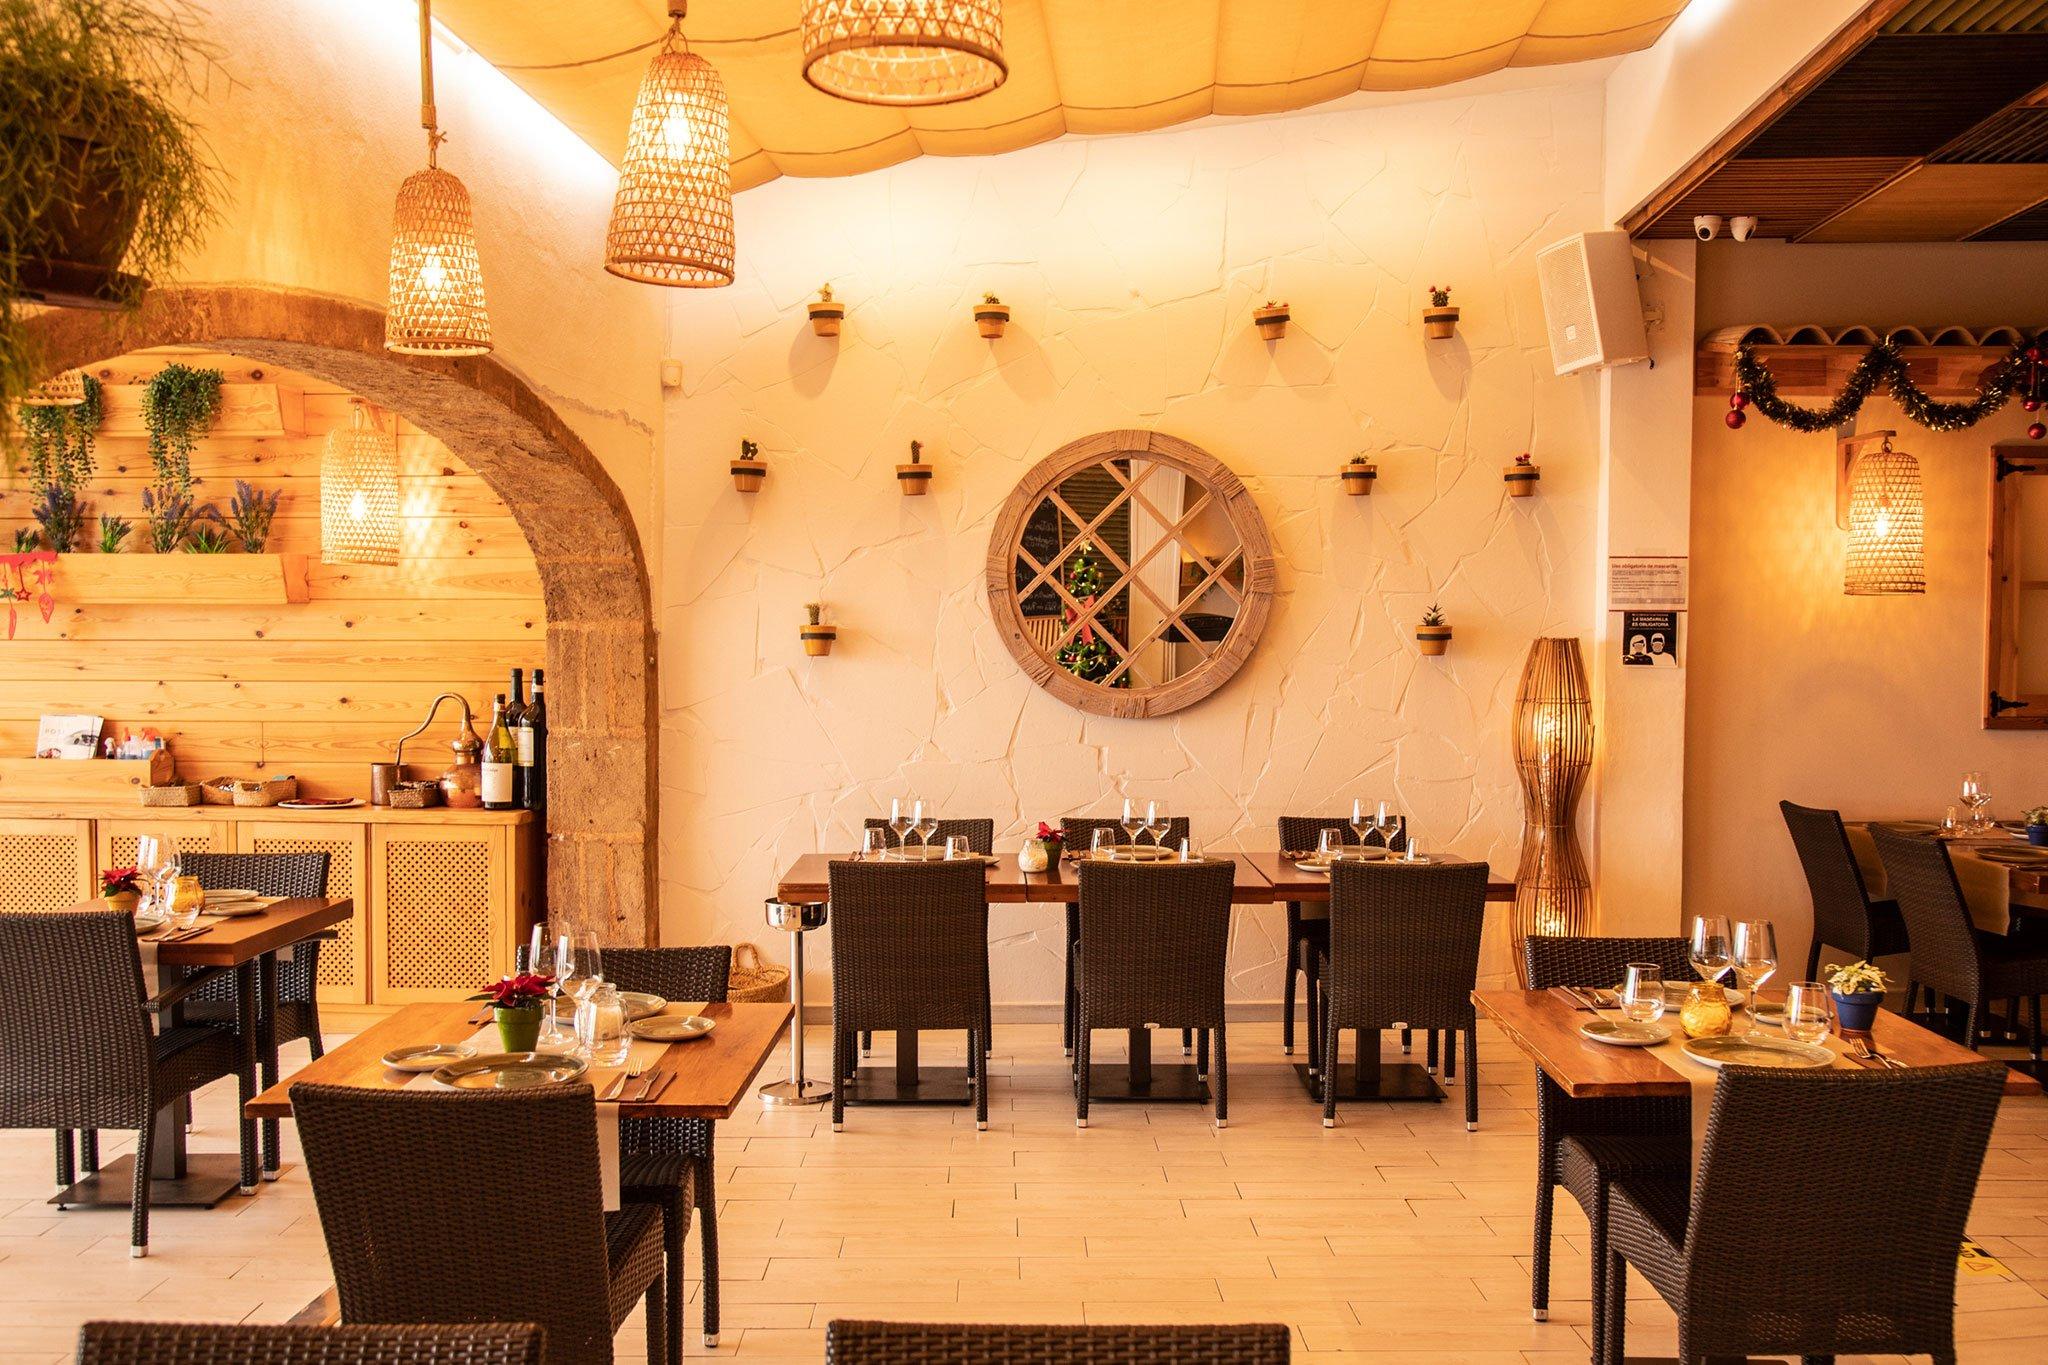 Decoración de Restaurante Posidonia